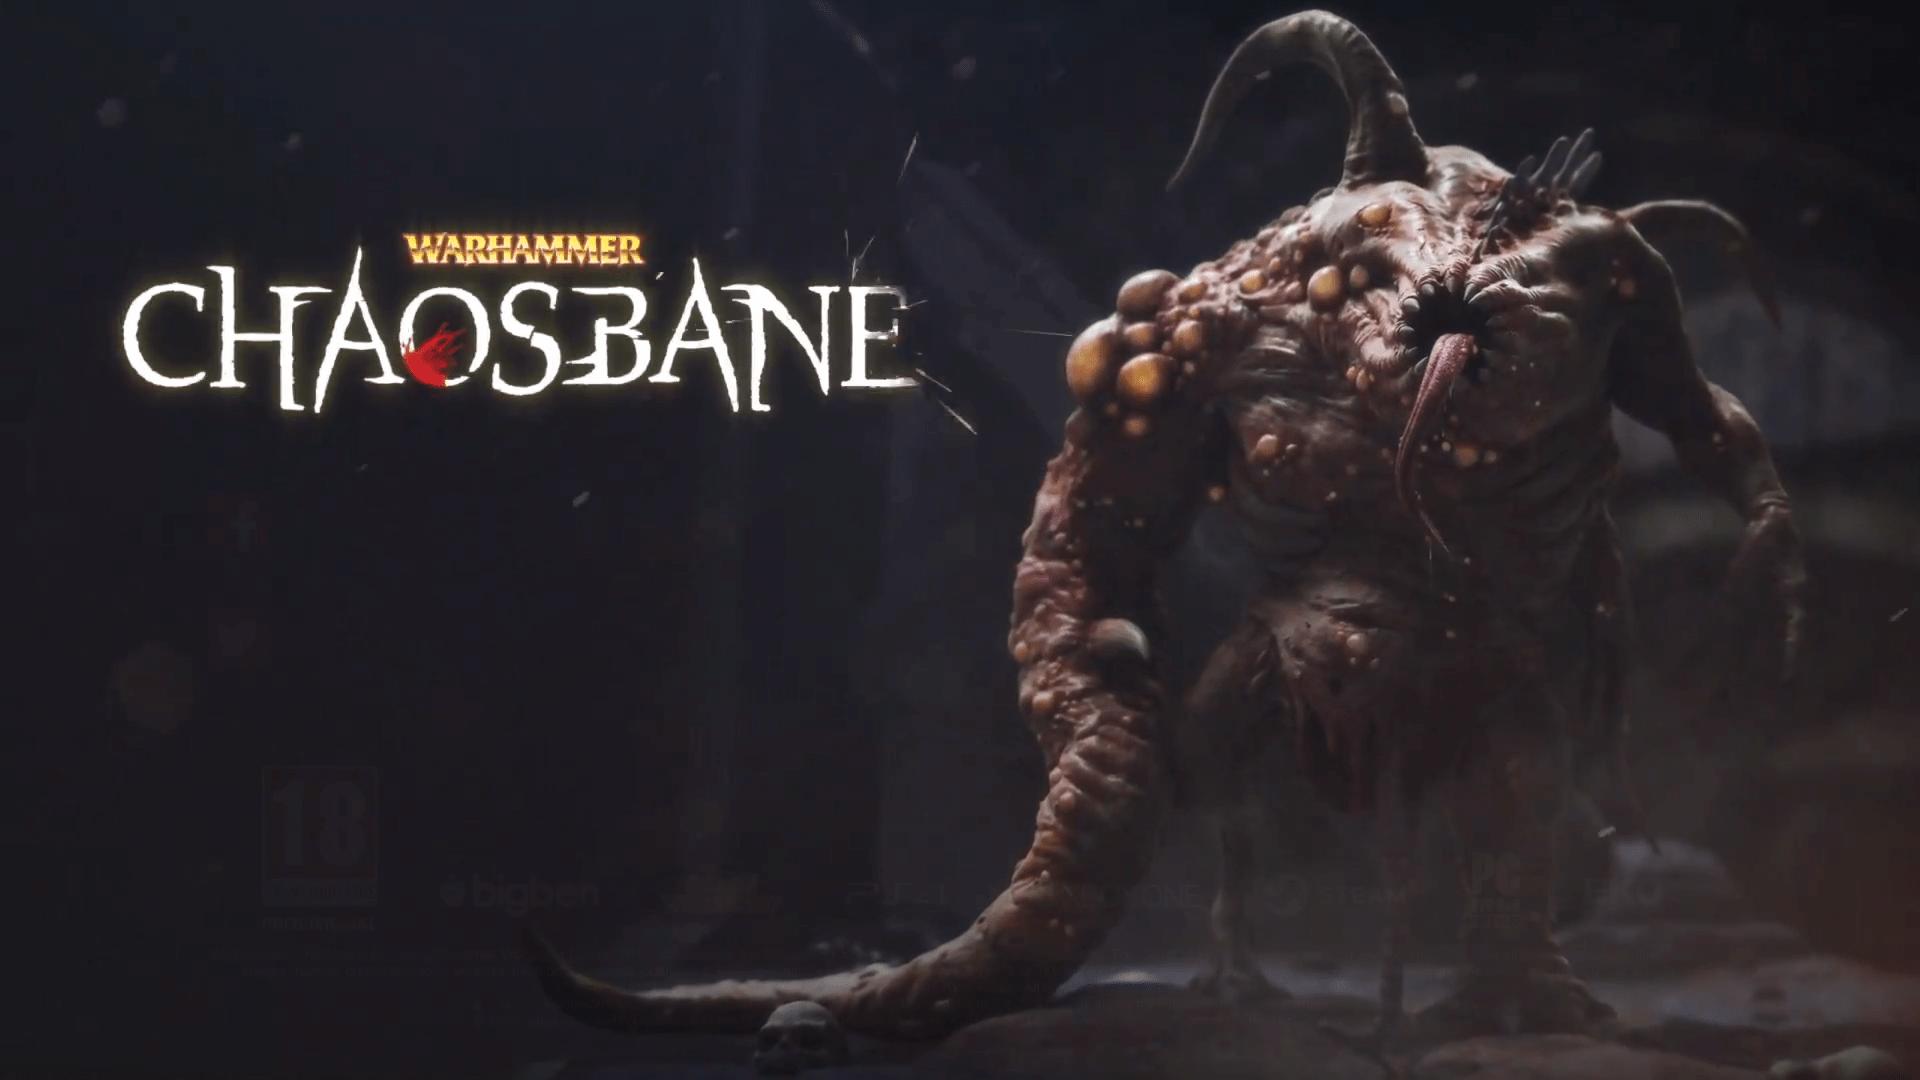 Warhammer: Chaosbane Wallpapers - Wallpaper Cave